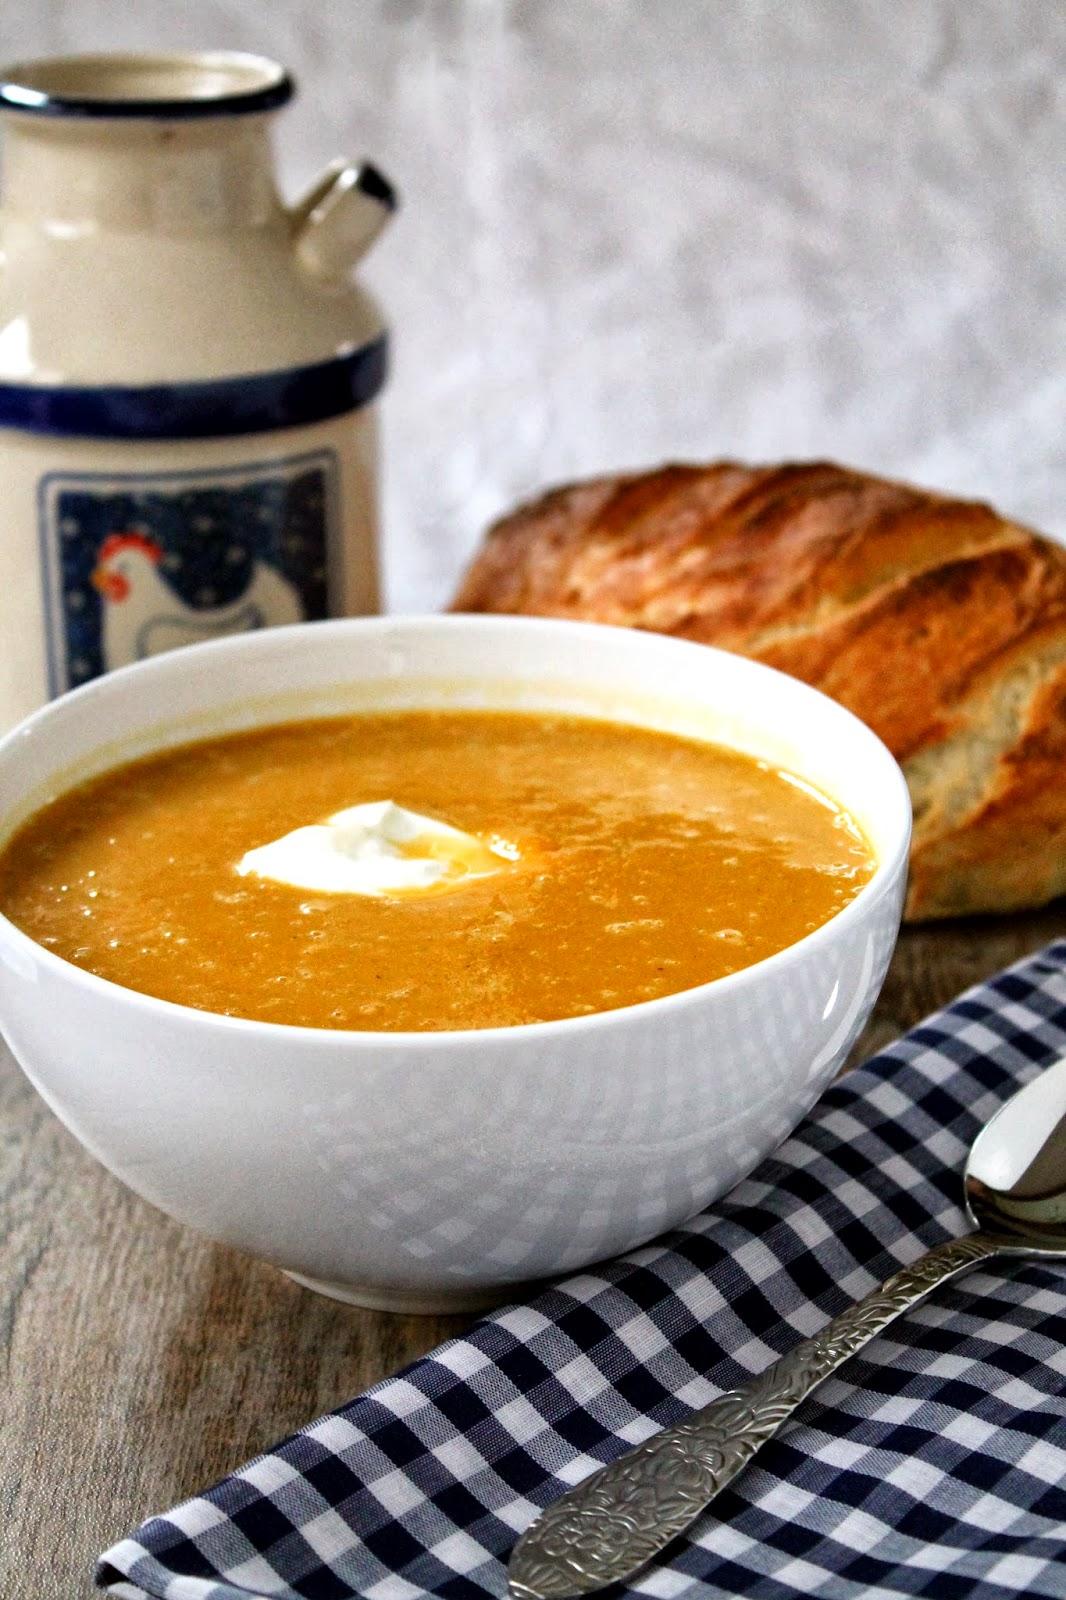 Masala-Spiced Roasted Butternut Squash Soup